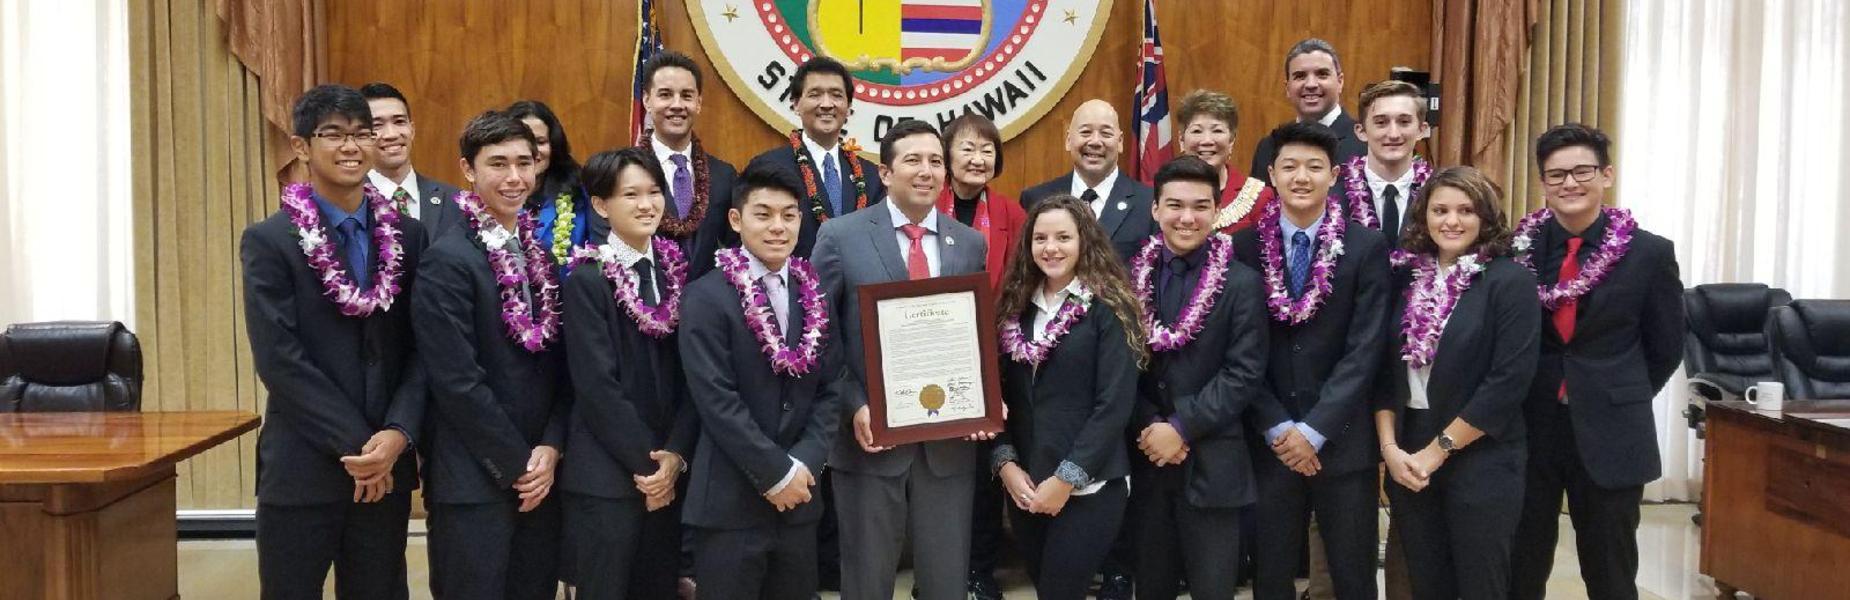 Kasier media club recognized by Honolulu Council members